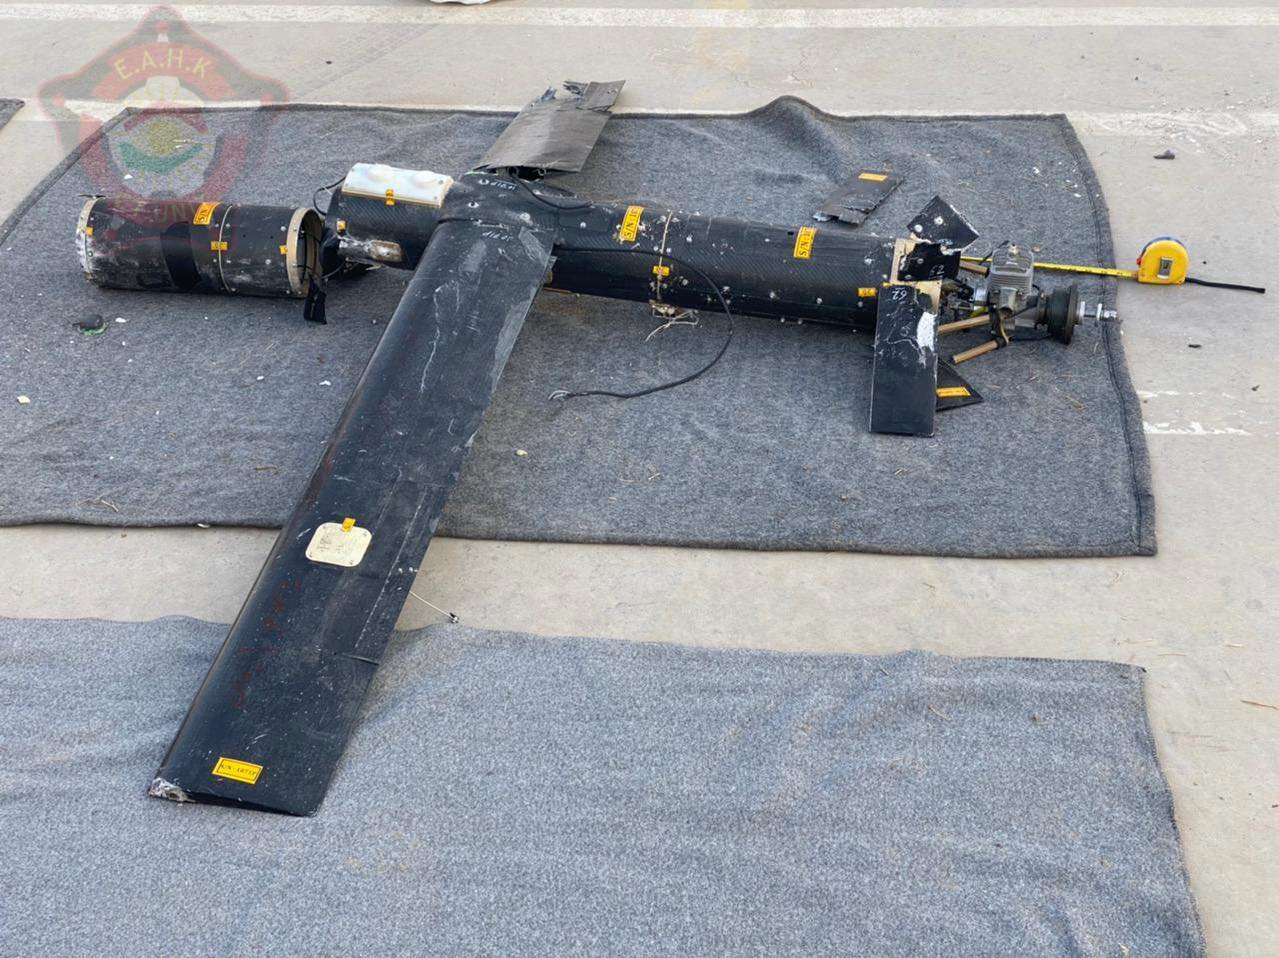 Kurdistan Authorities Released Photos Of Mysterious Suicide Drones Used In Recent Attack